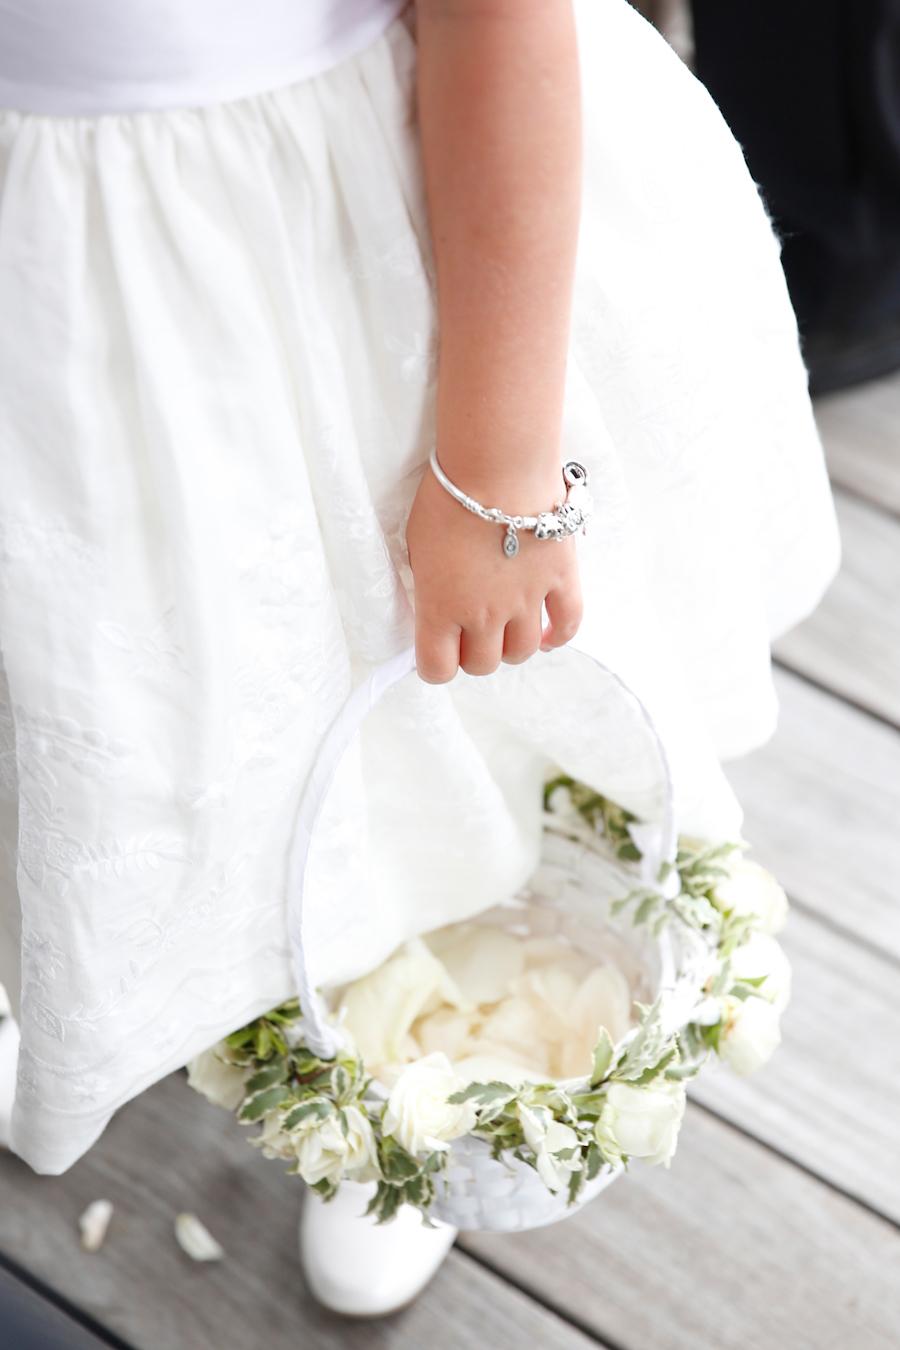 daniel restaurant ang weddings and events belathee-26.jpg